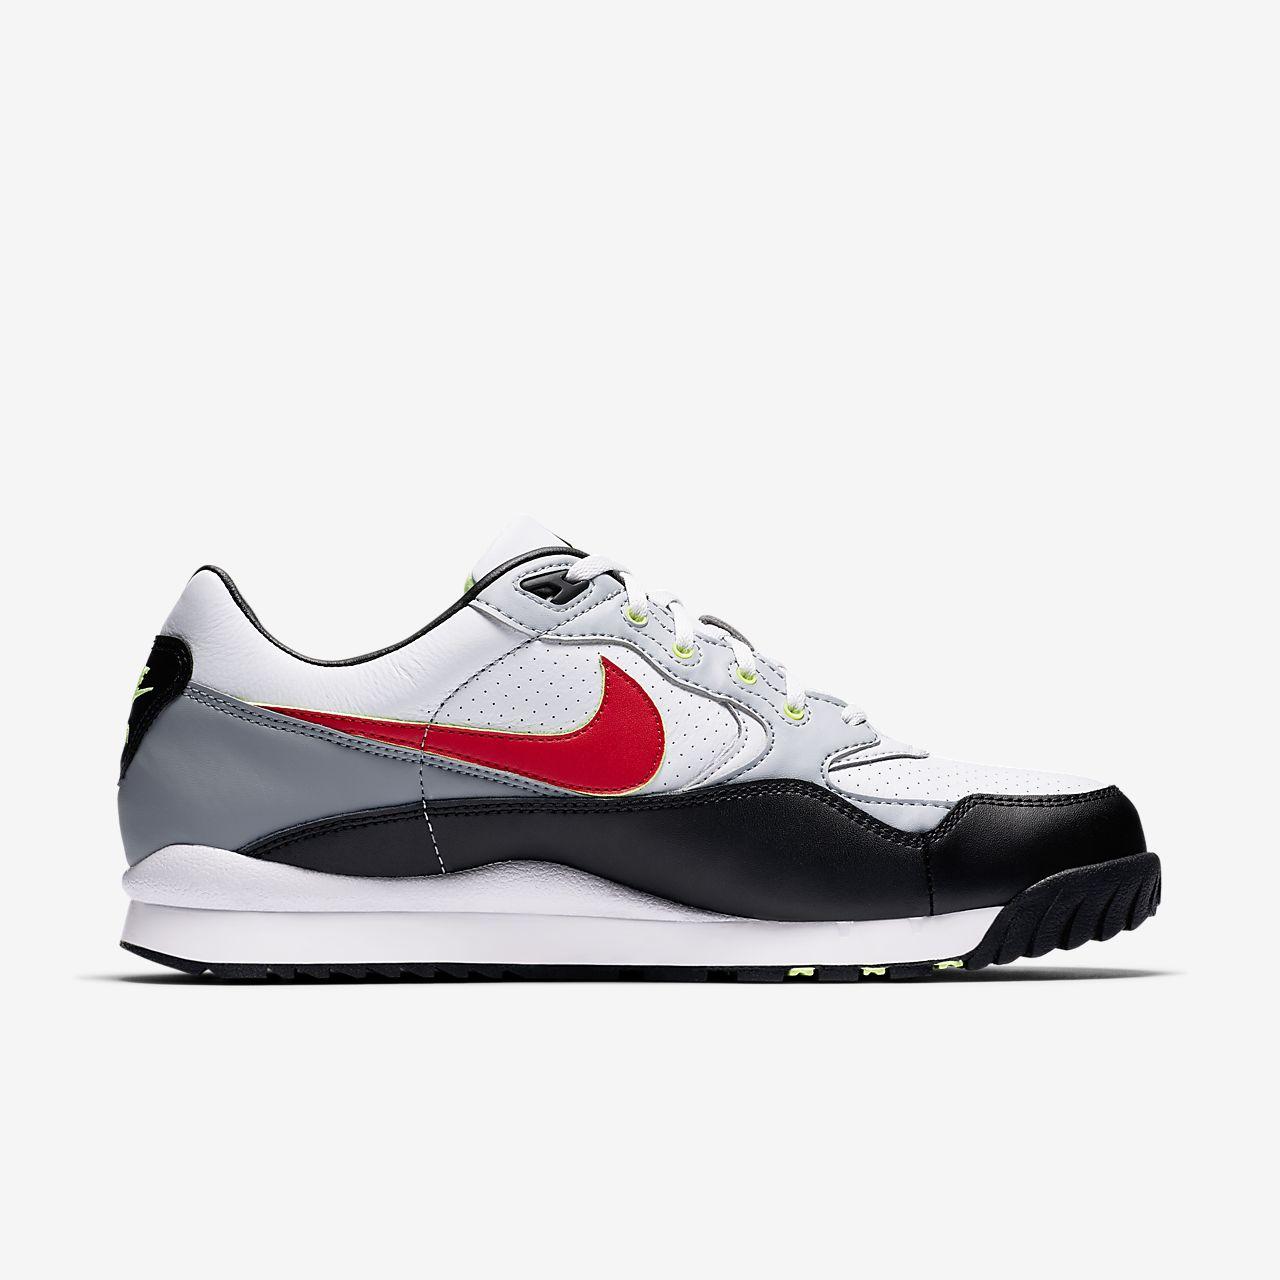 Chaussure Anniversaire Nike Nike Anniversaire Gratuite Gratuite Chaussure 7bgmIY6fvy